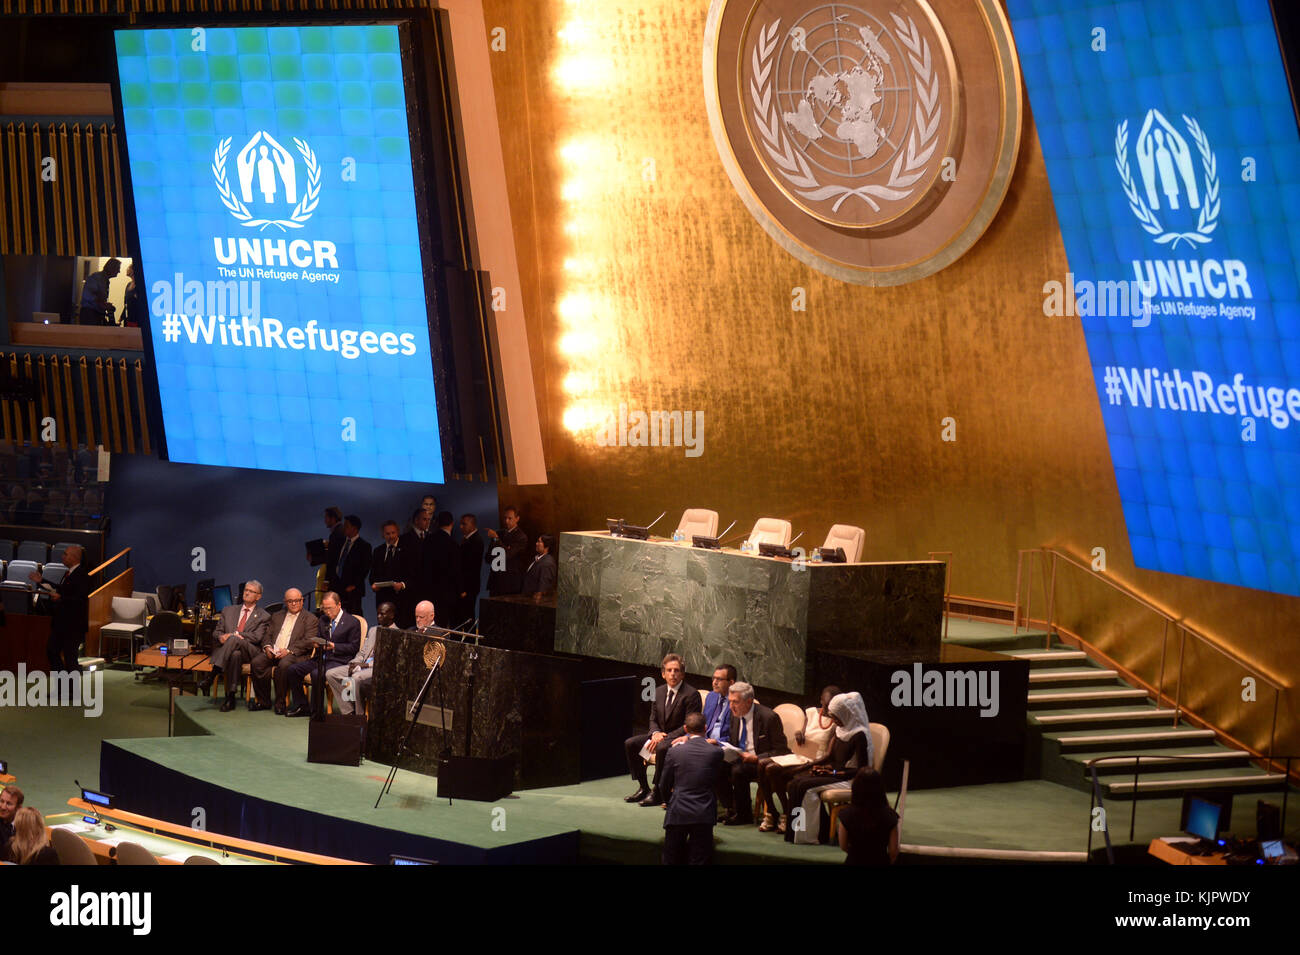 NEW YORK, NY - SEPTEMBER 16: UNHCR supporter Ben Stiller speaks during UNHCR #WithRefugees petition handover at - Stock Image